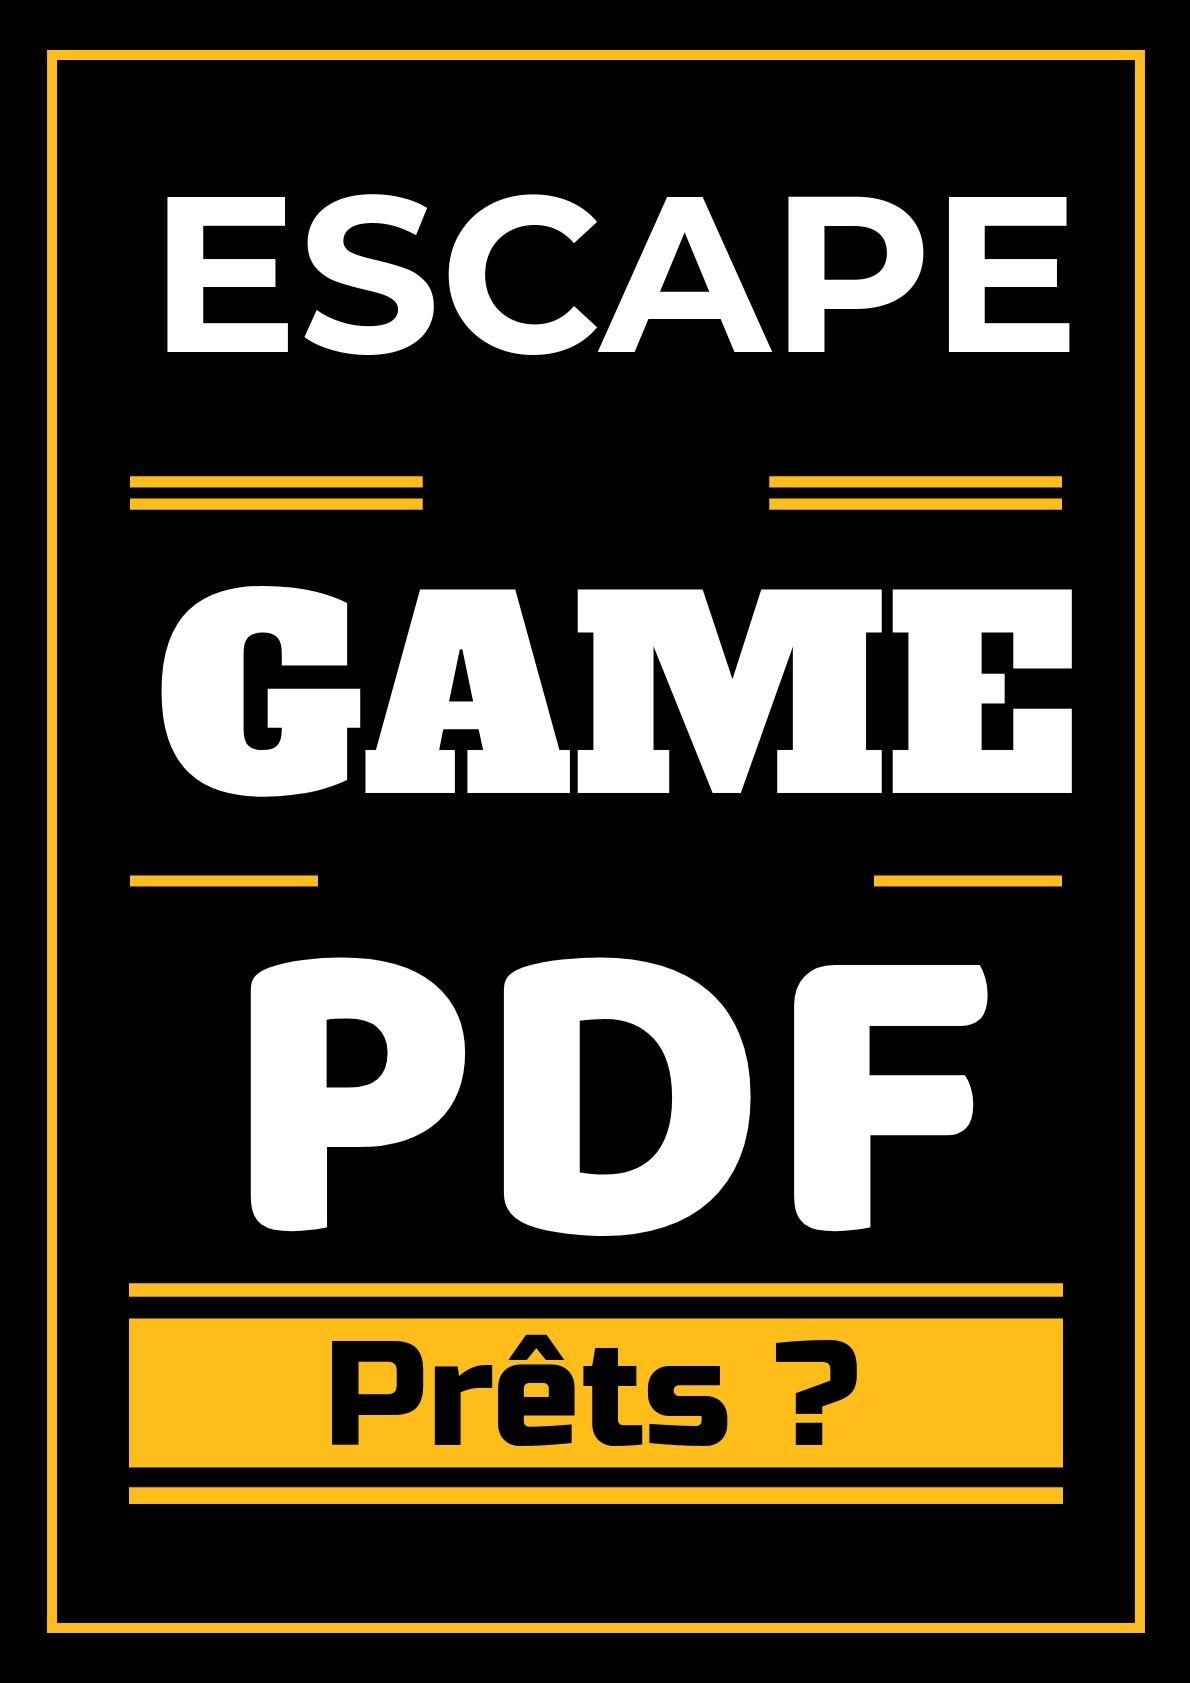 escape and evasion manual pdf